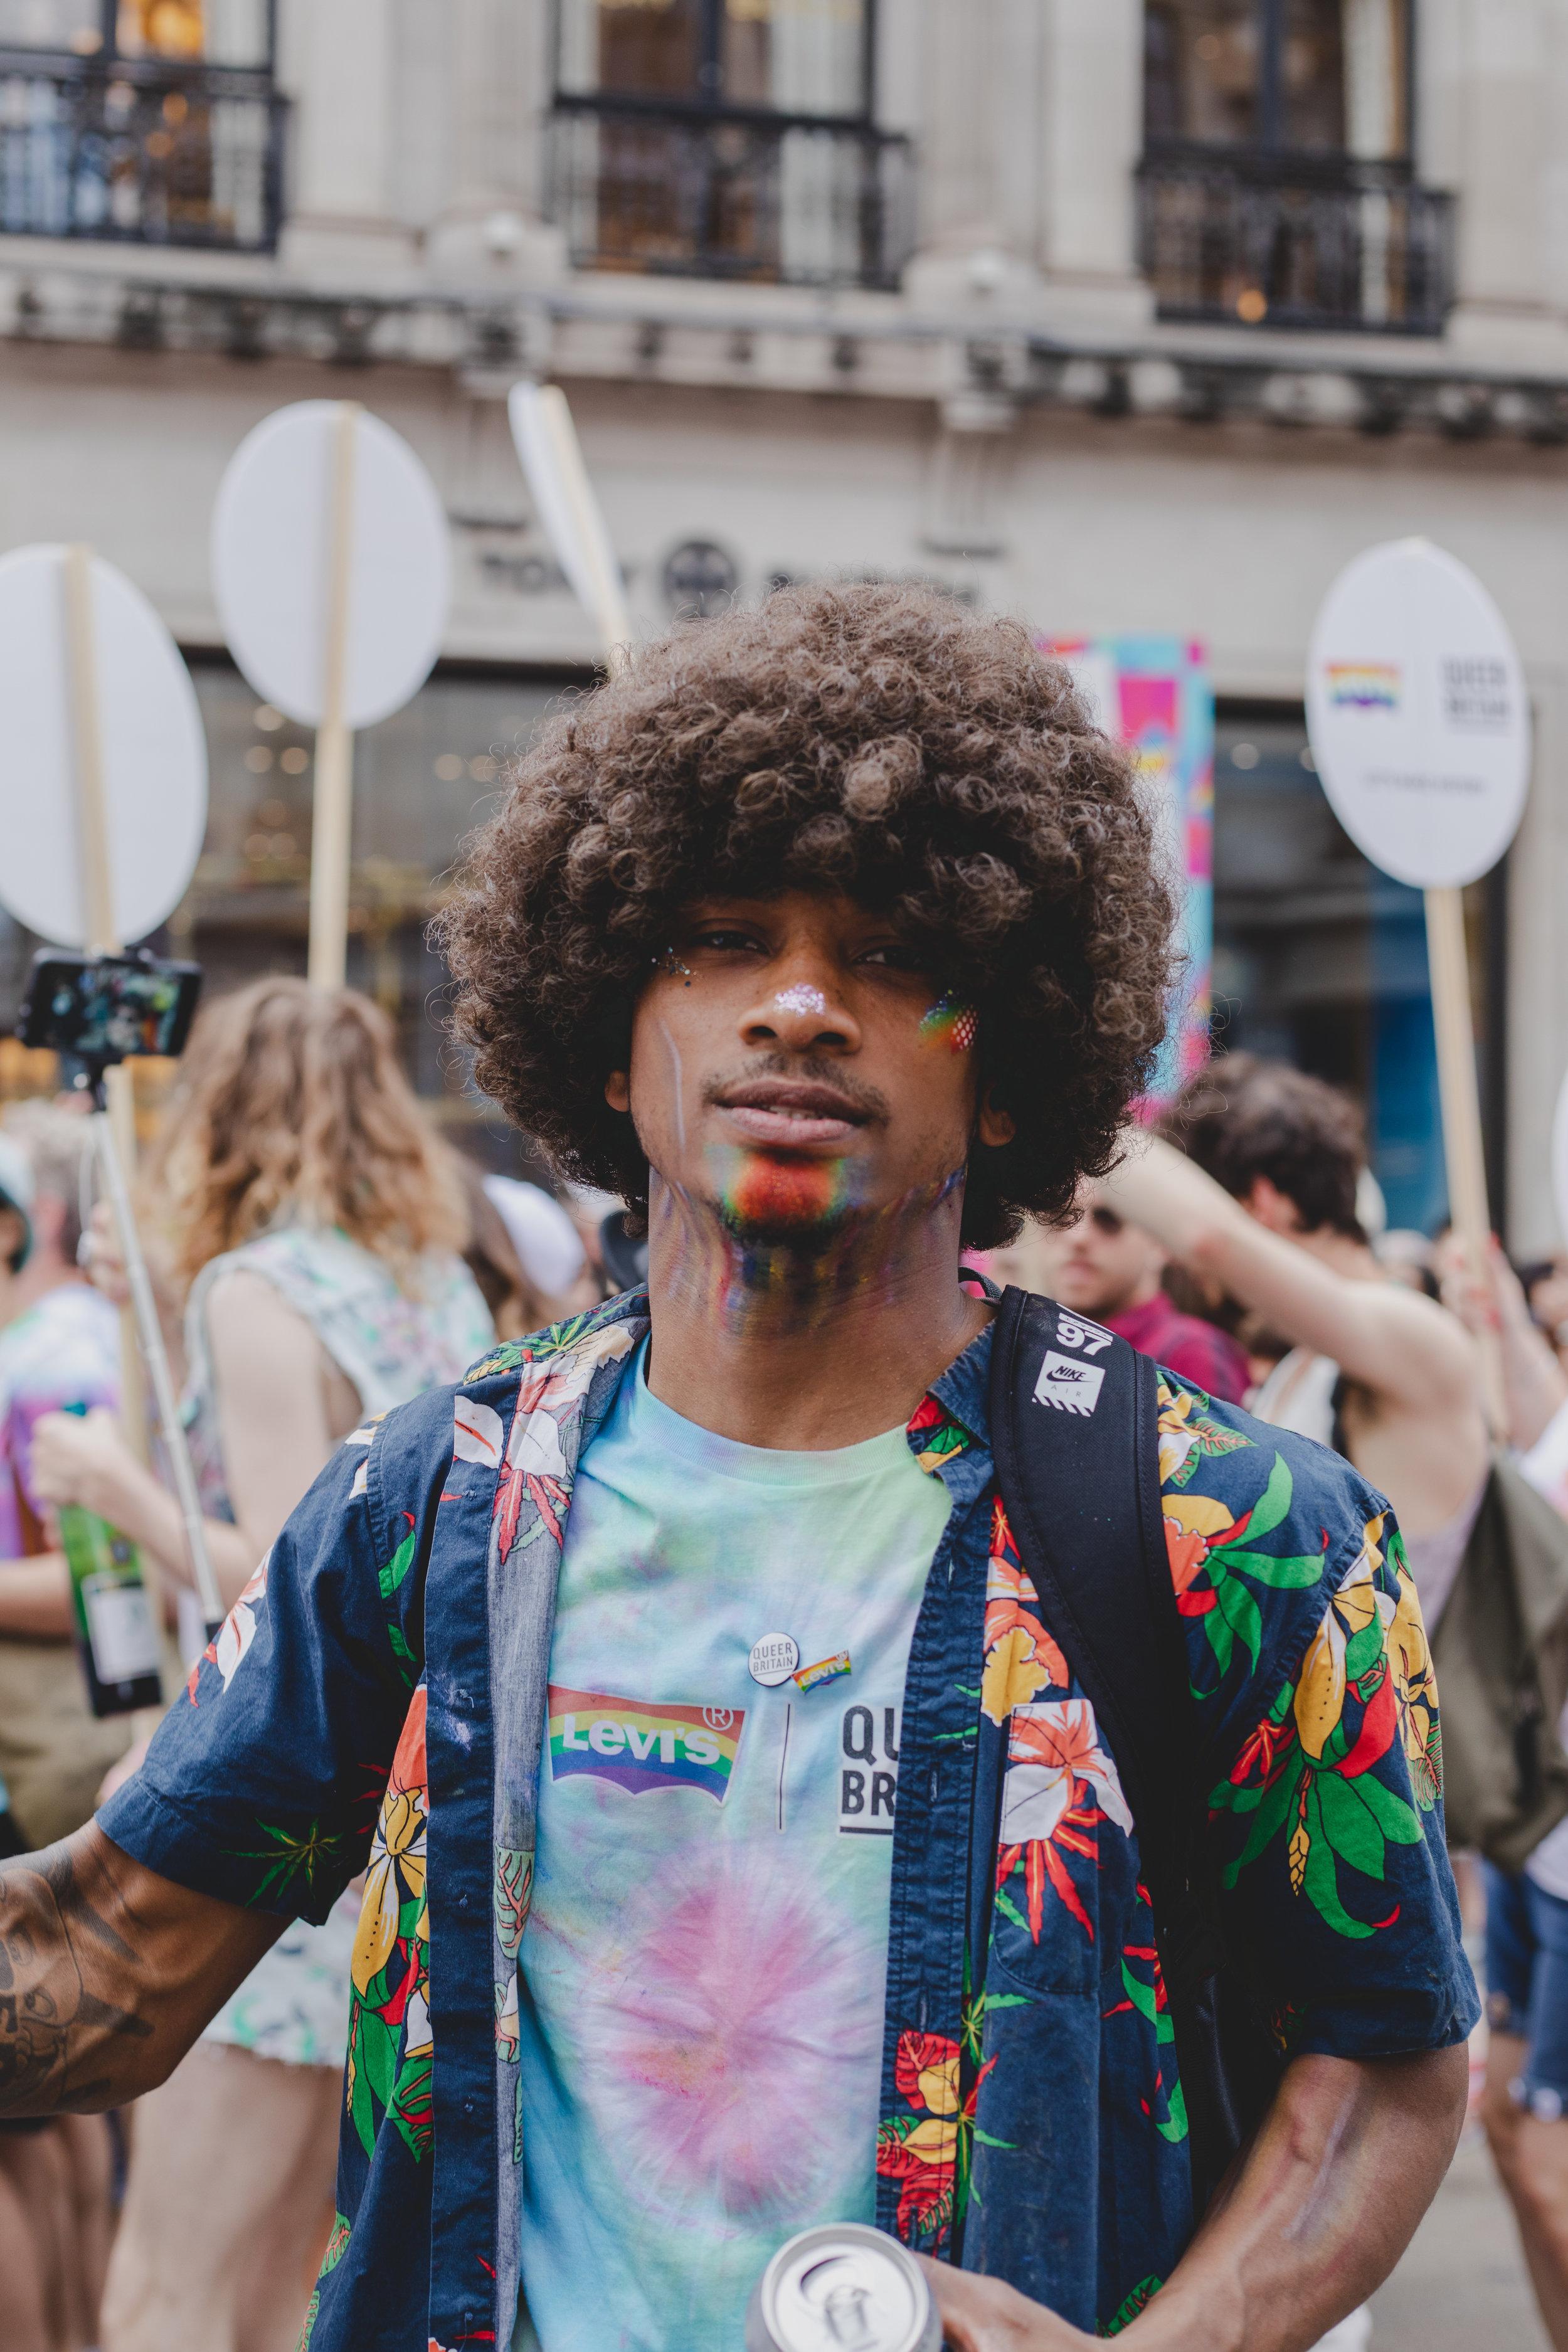 Pride in London 2019 - Queer Britain x Levis